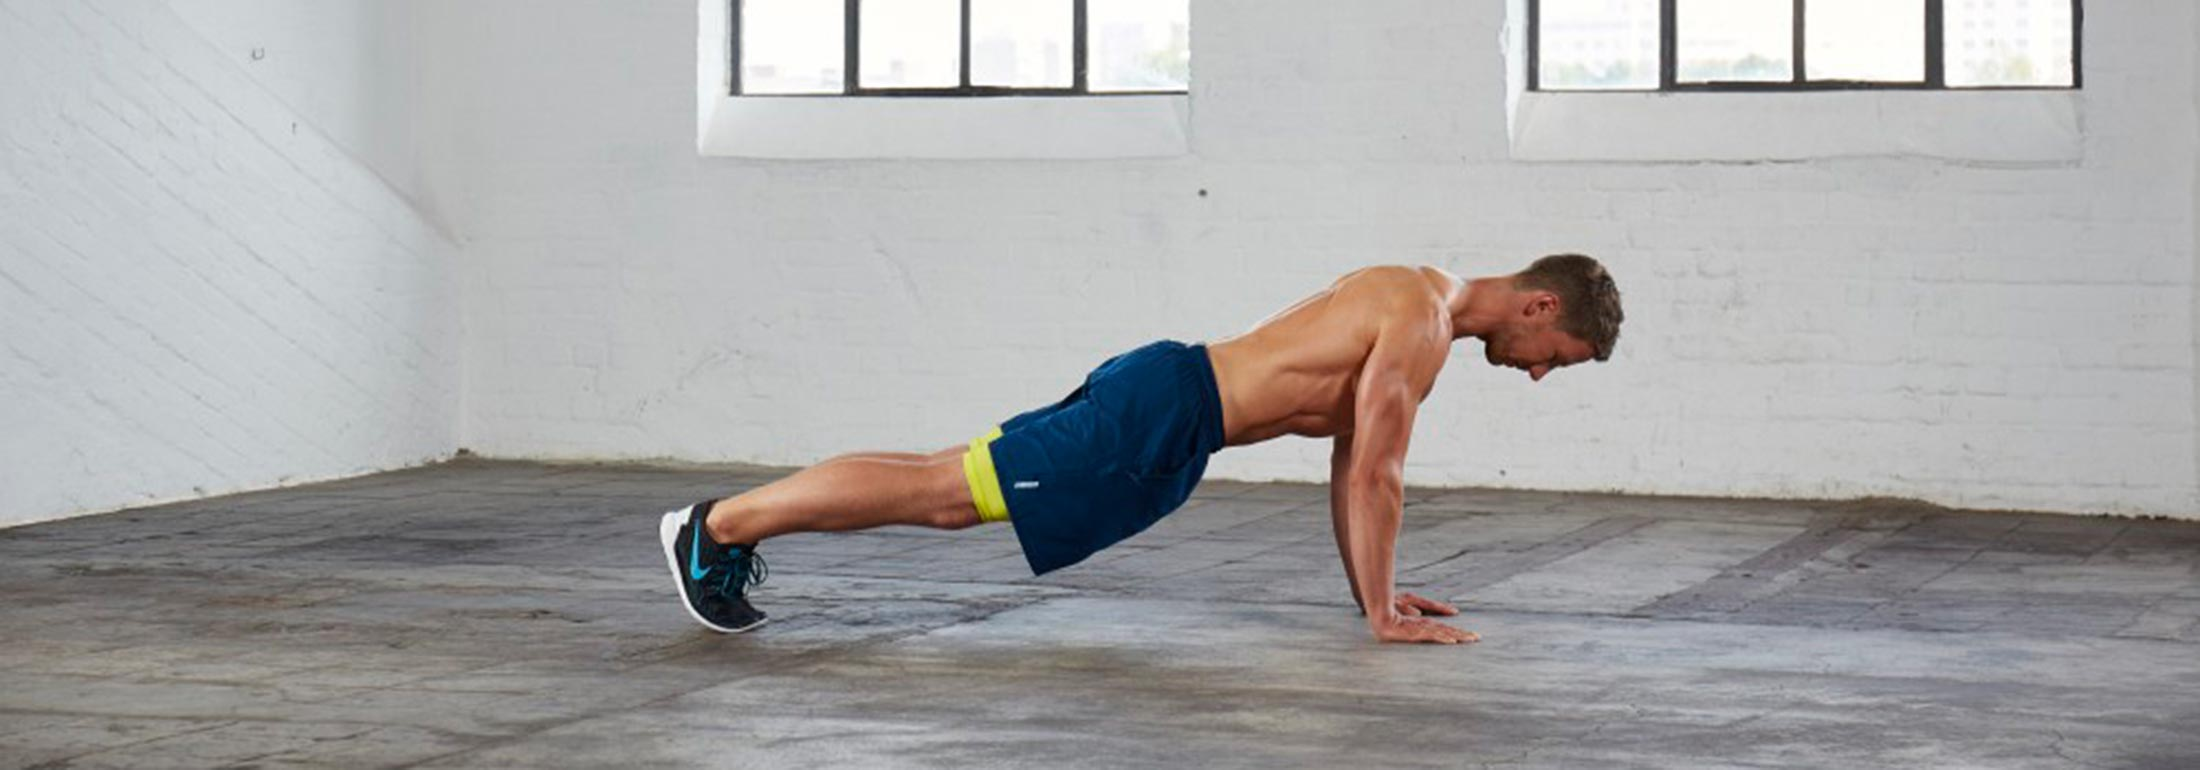 Muskelaufbau Übungen Liegestütze